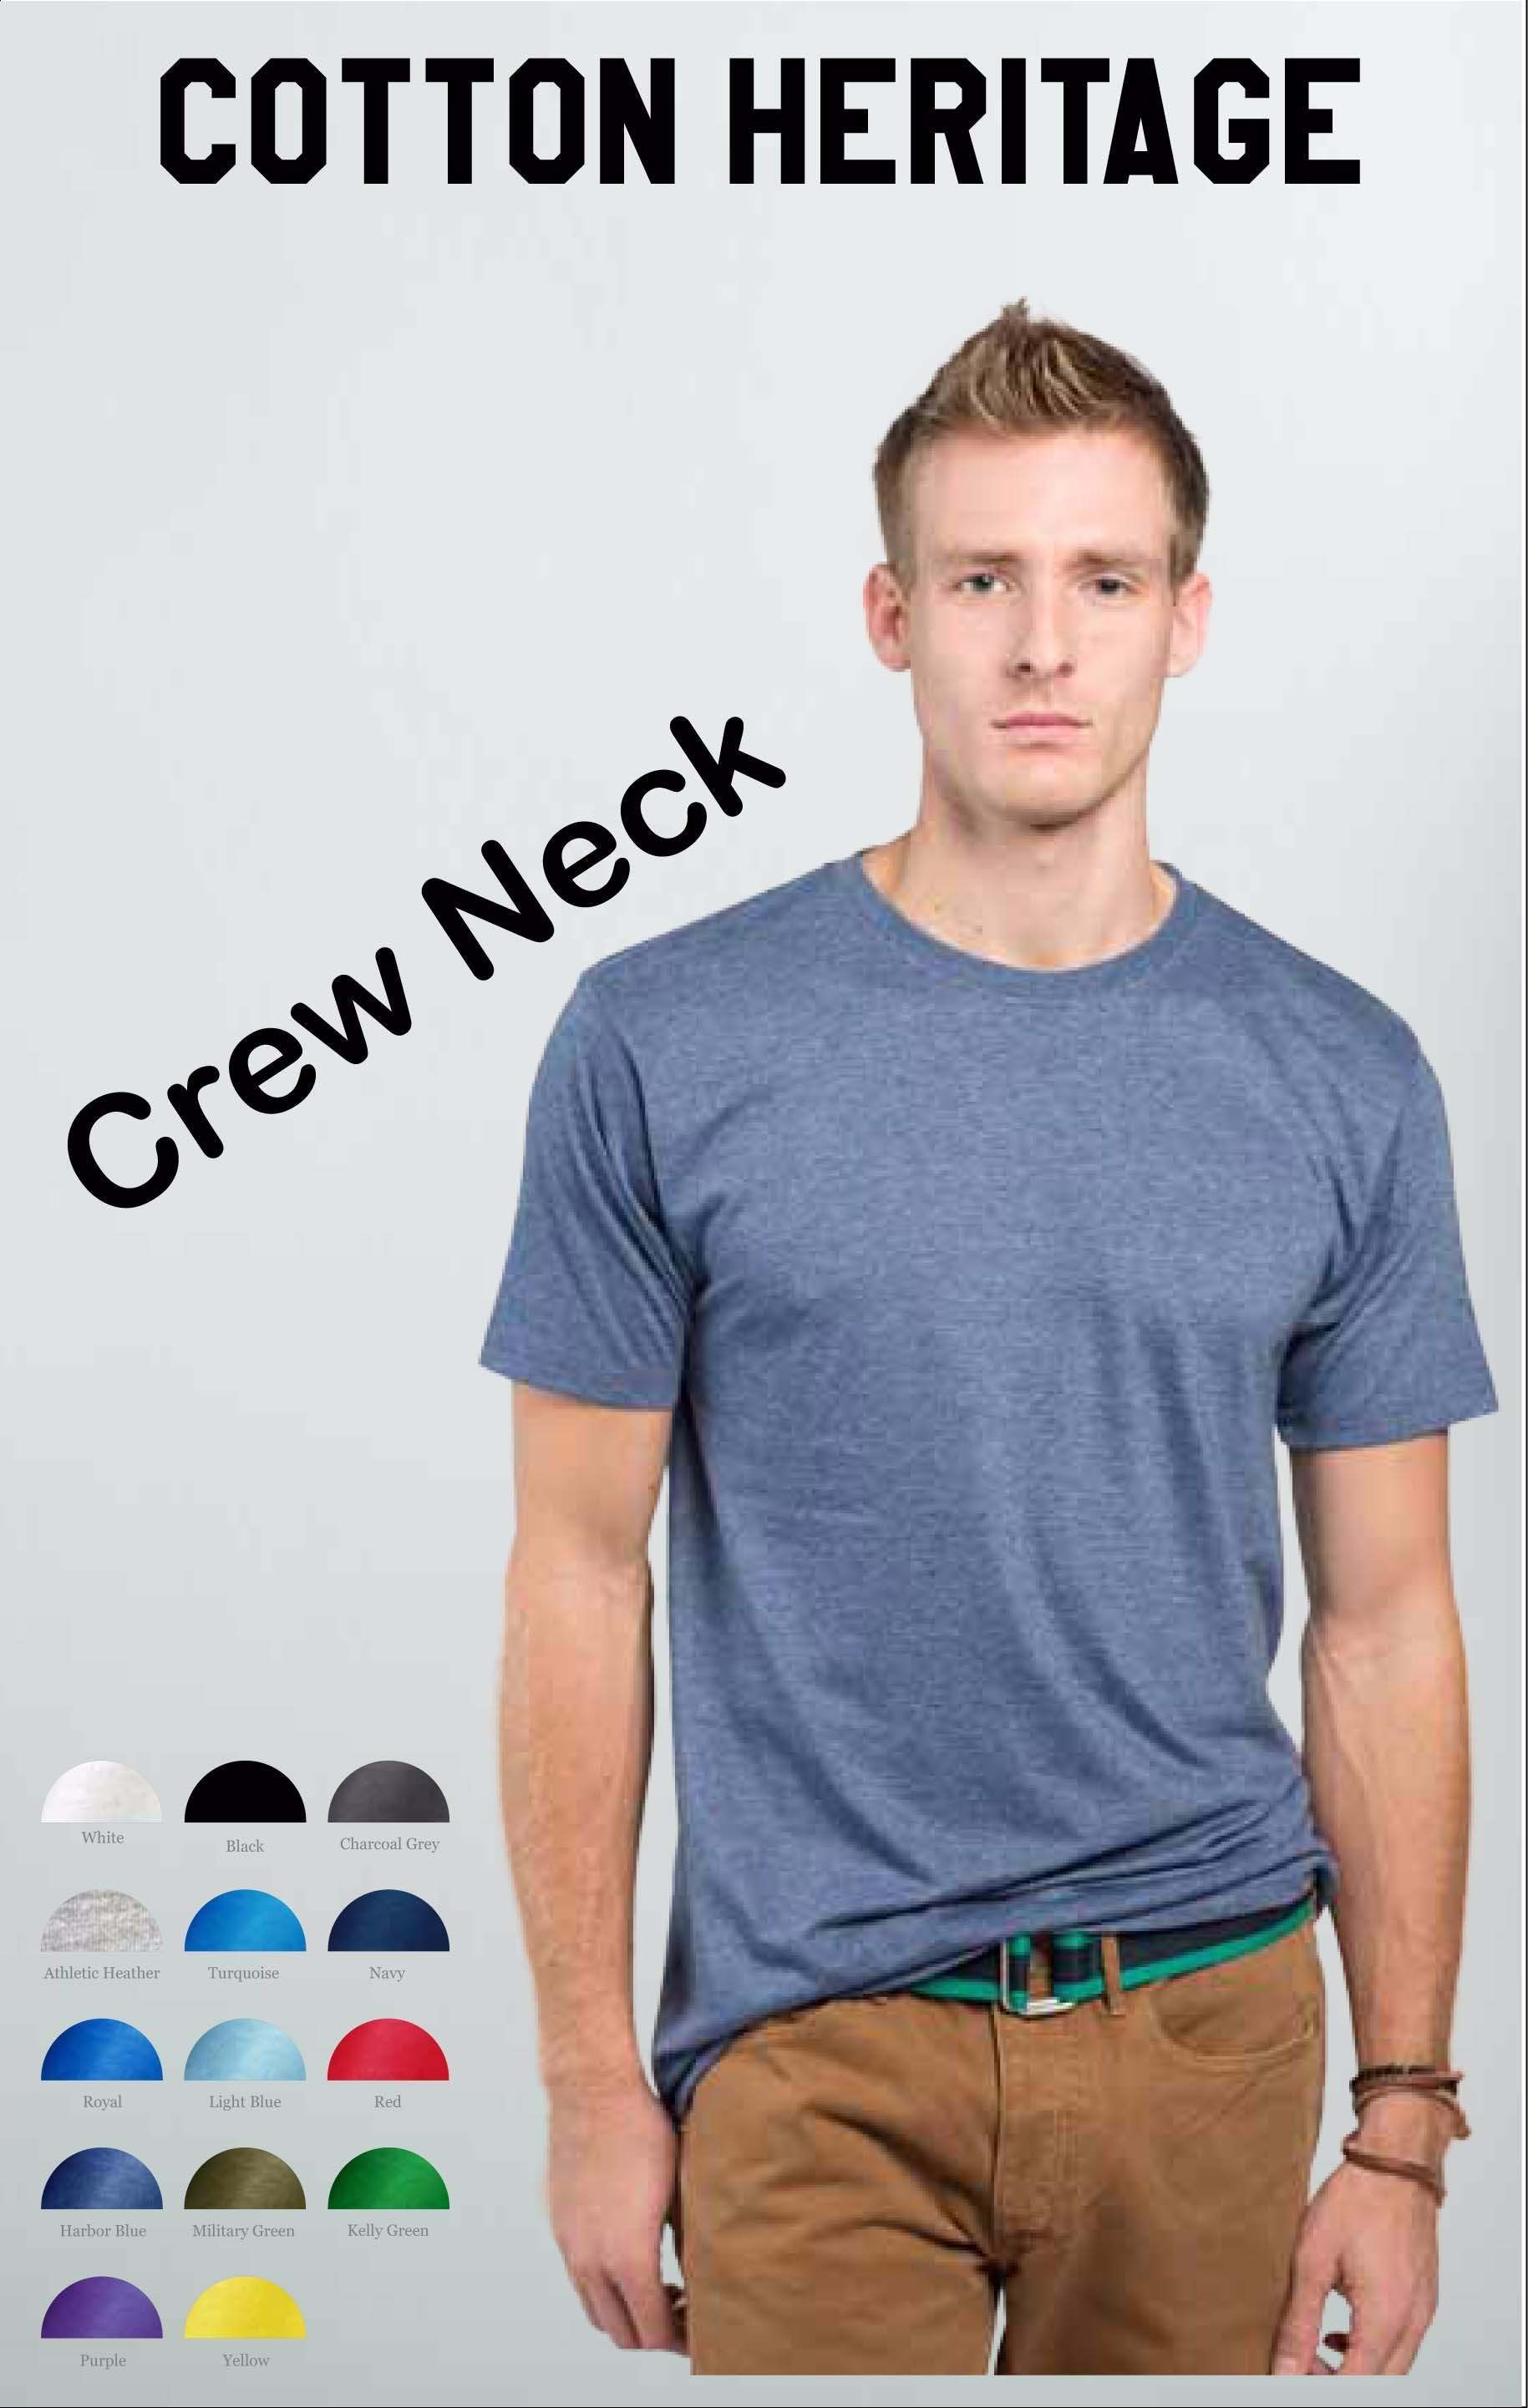 wholesale t shirts N image 10